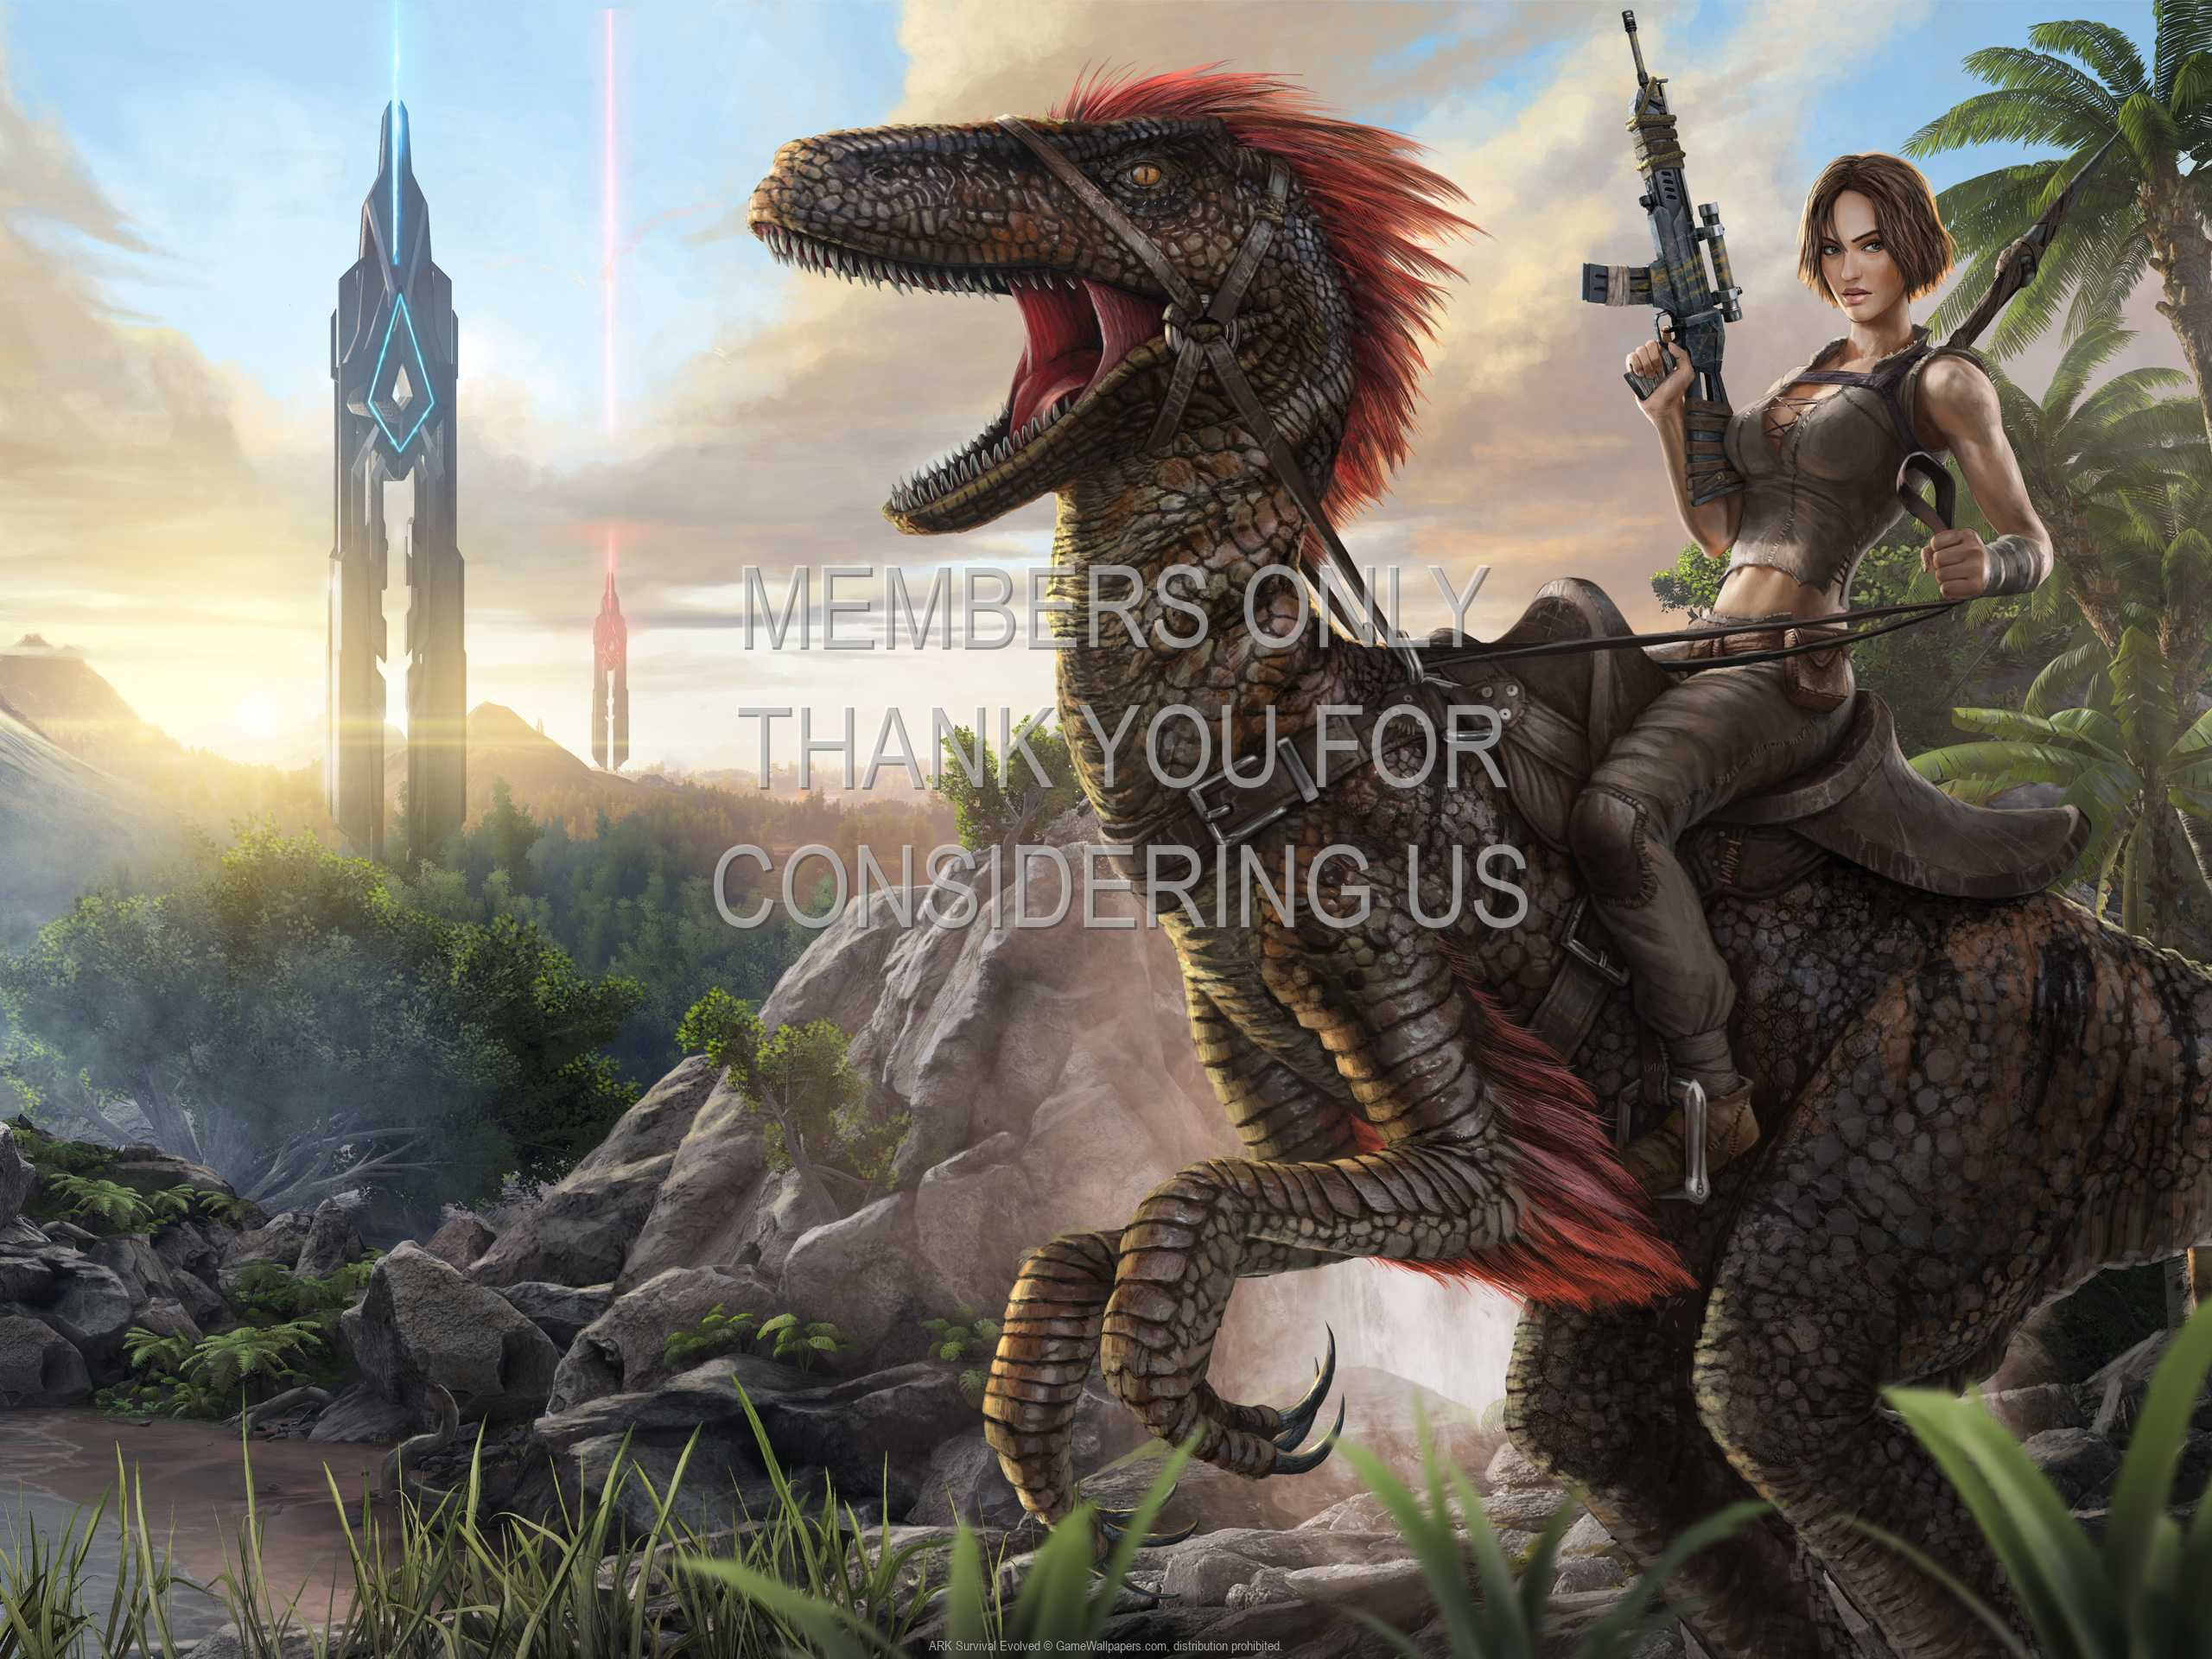 ARK: Survival Evolved 1080p Horizontal Mobile wallpaper or background 01